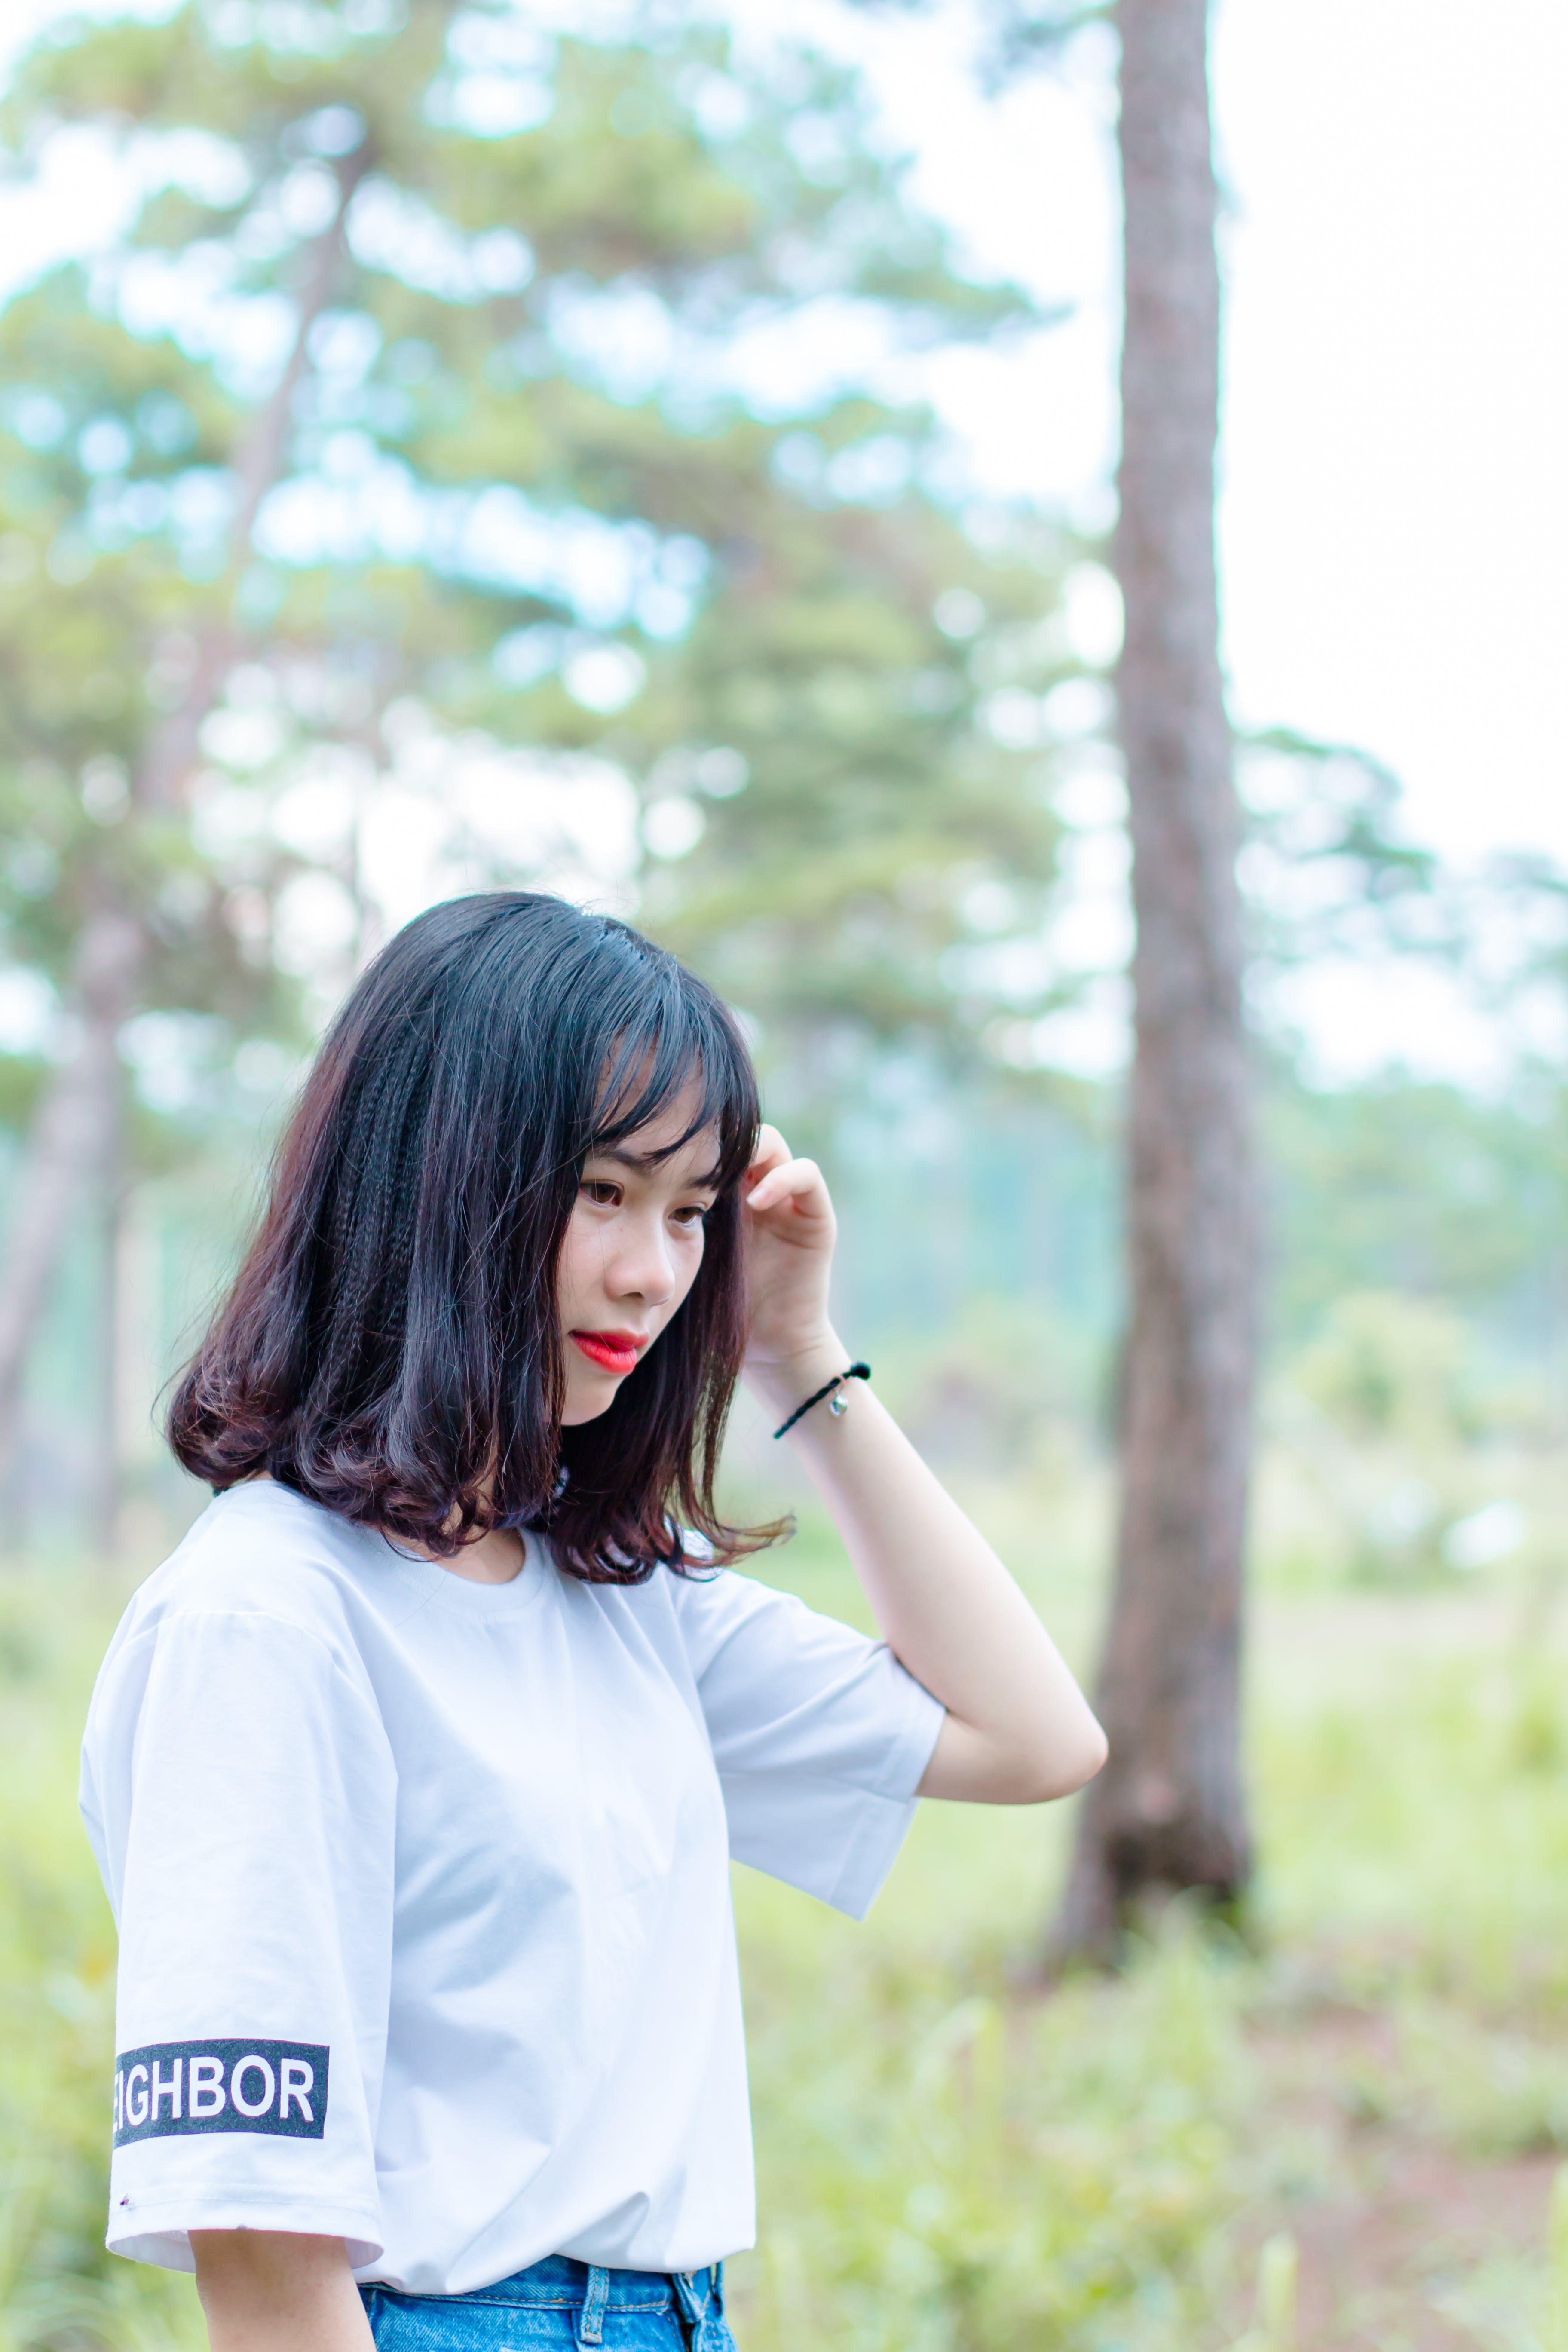 Fotos de stock gratuitas de asiática, belleza, bonita, bonito